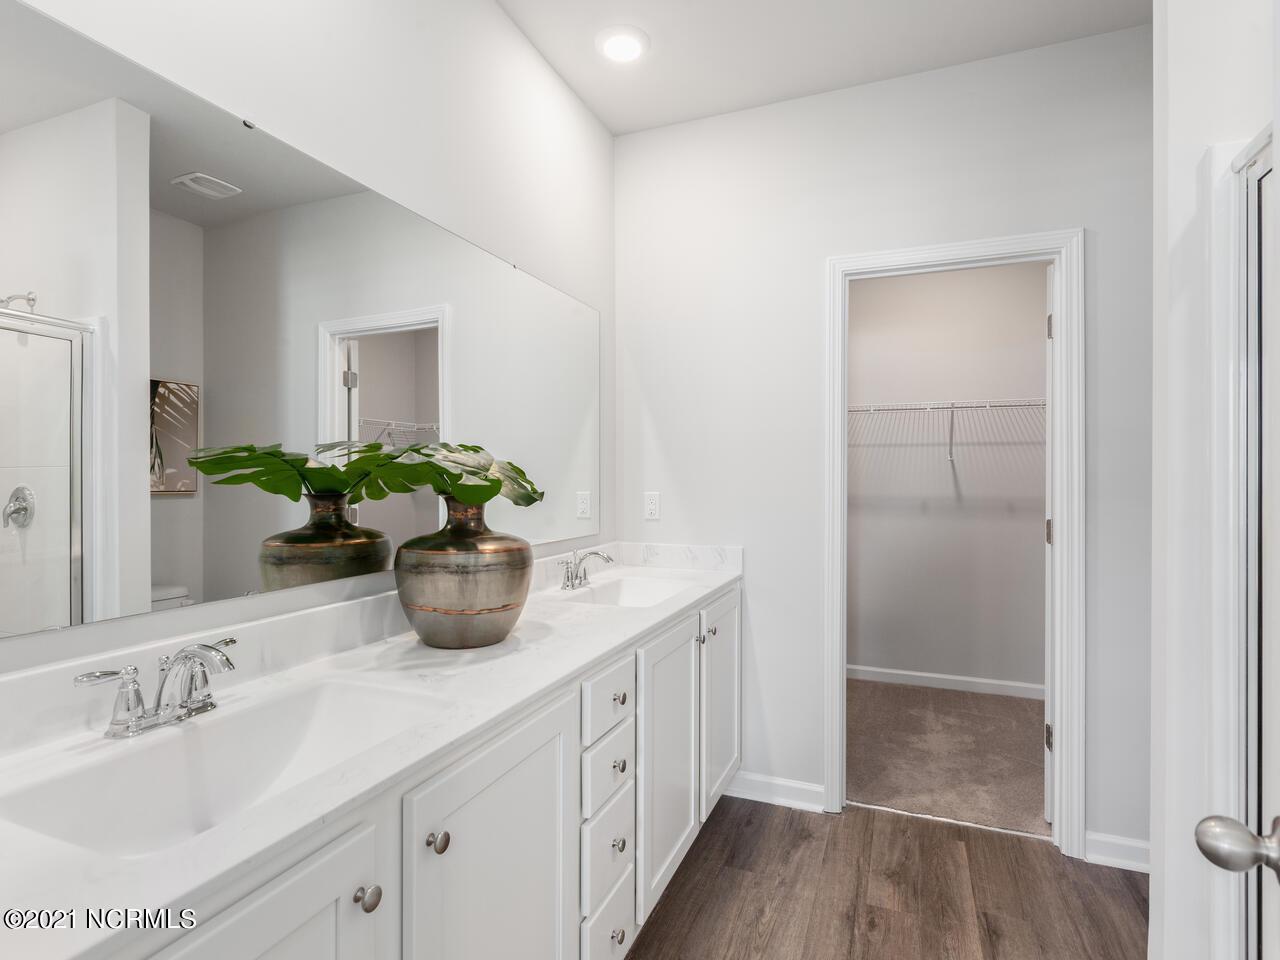 7623 Knightbell Circle, Leland, North Carolina 28451, 3 Bedrooms Bedrooms, 7 Rooms Rooms,2 BathroomsBathrooms,Townhouse,For sale,Knightbell,100275126